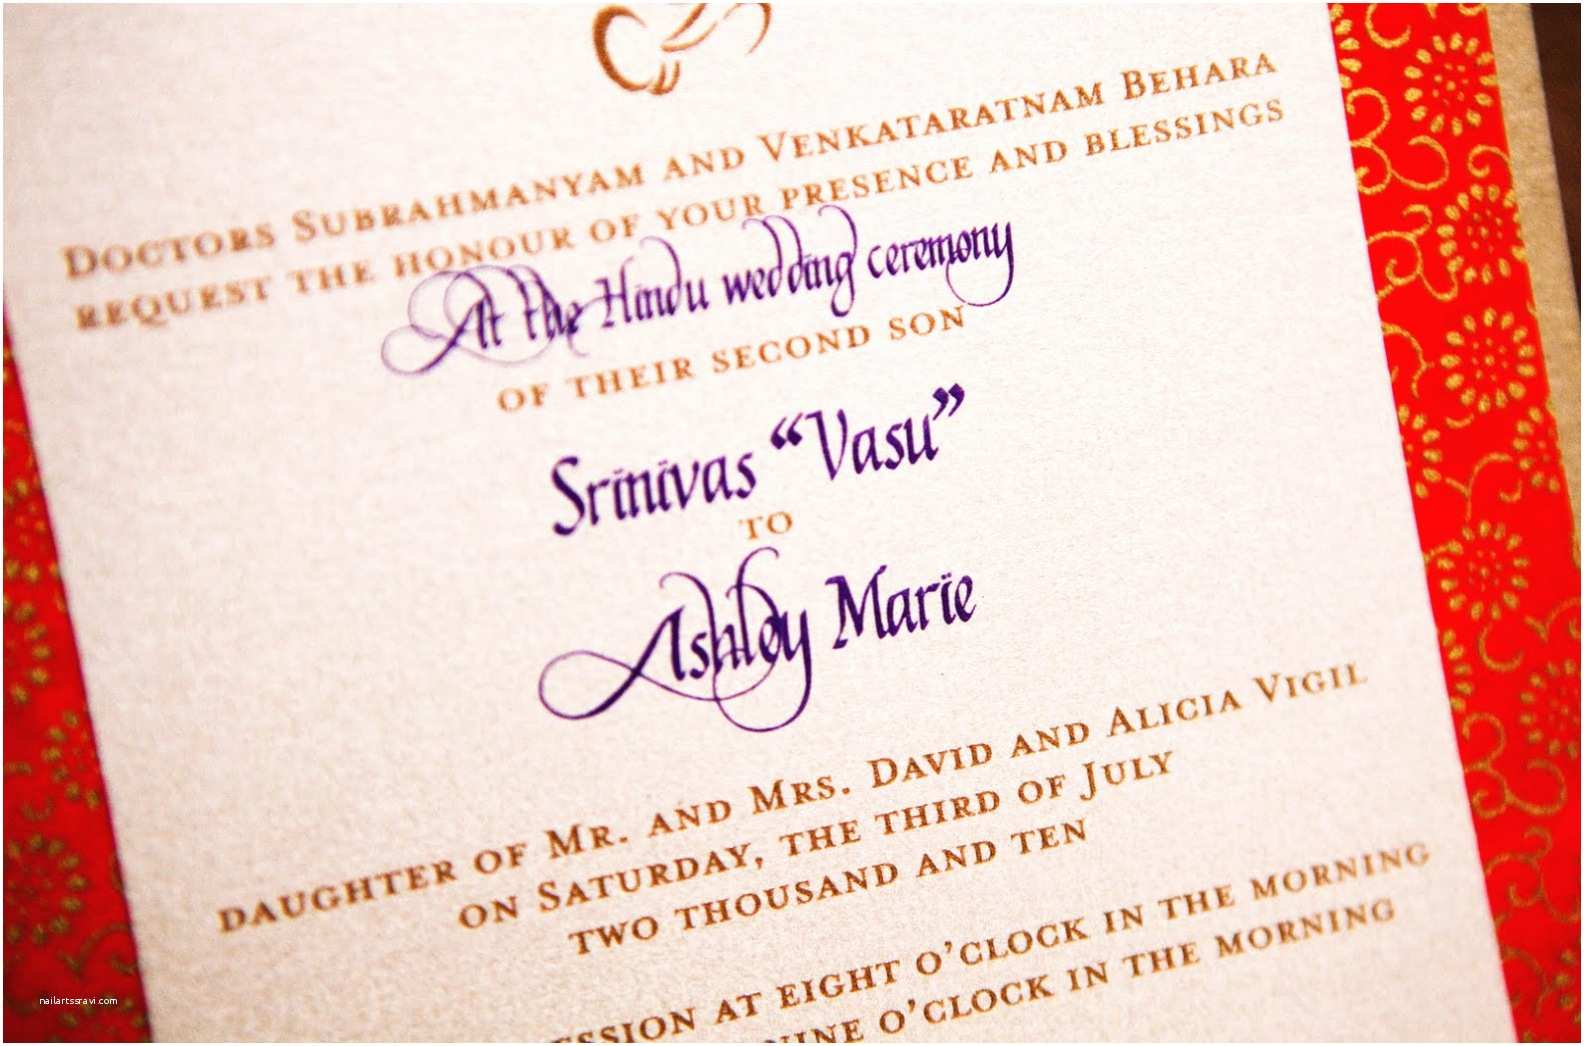 Wedding Invitation For Indian Wedding Hindu Wedding Ceremony Invitation Wording In